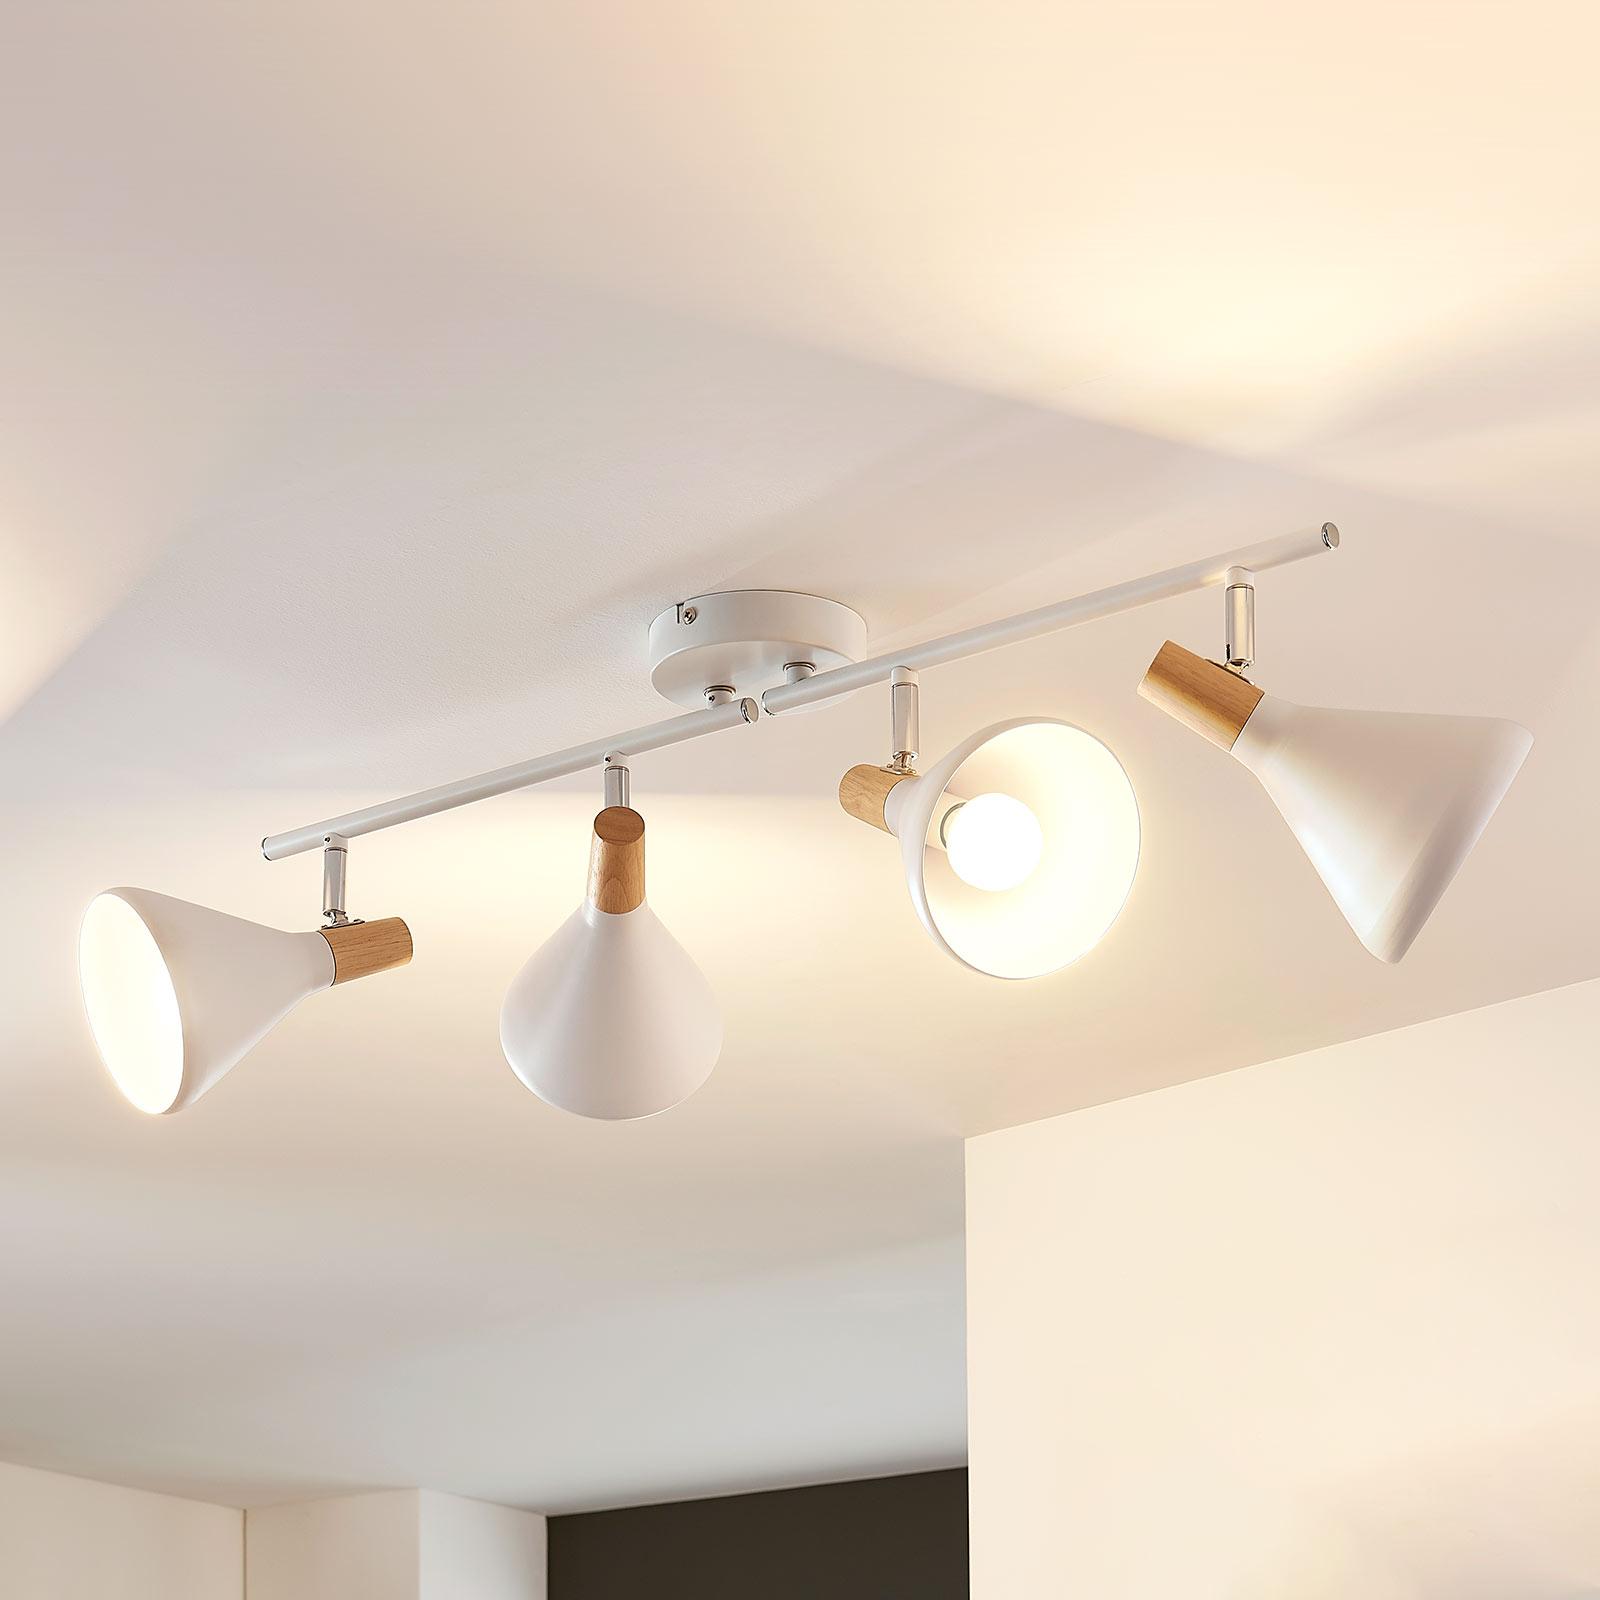 4-punktowa lampa sufitowa LED, Arina z drewnem